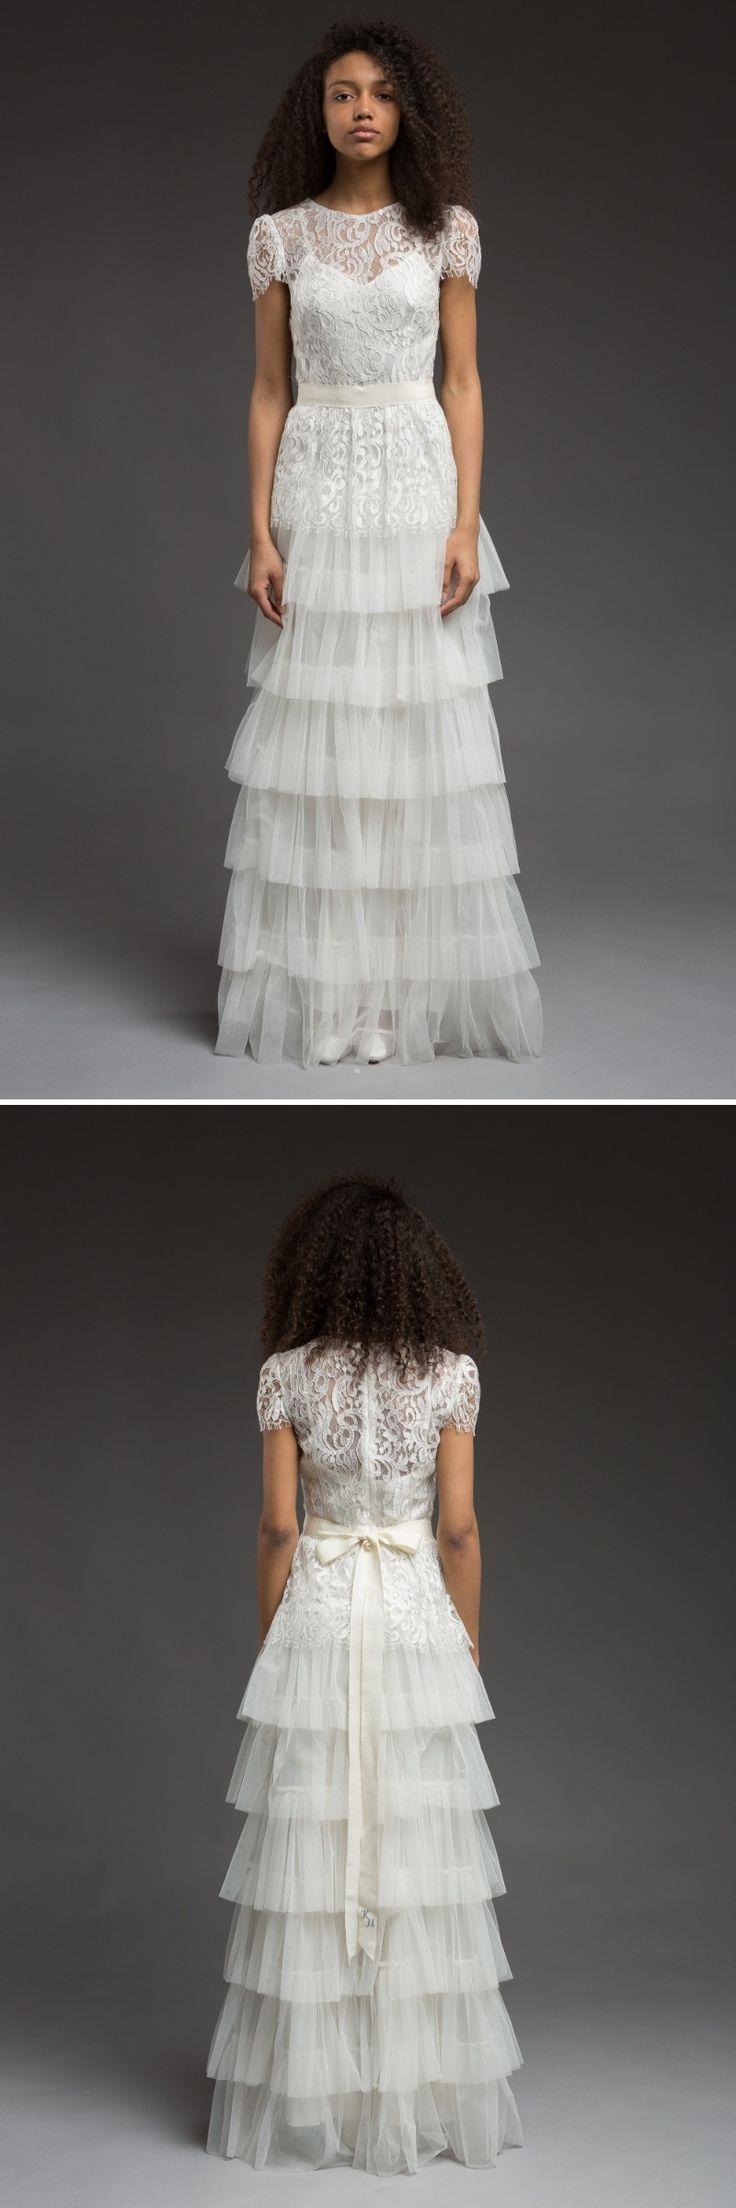 Tulle Tiered Vintage Inspired Wedding Dress || 2017 Wedding Dress from Katya Katya Shehurina